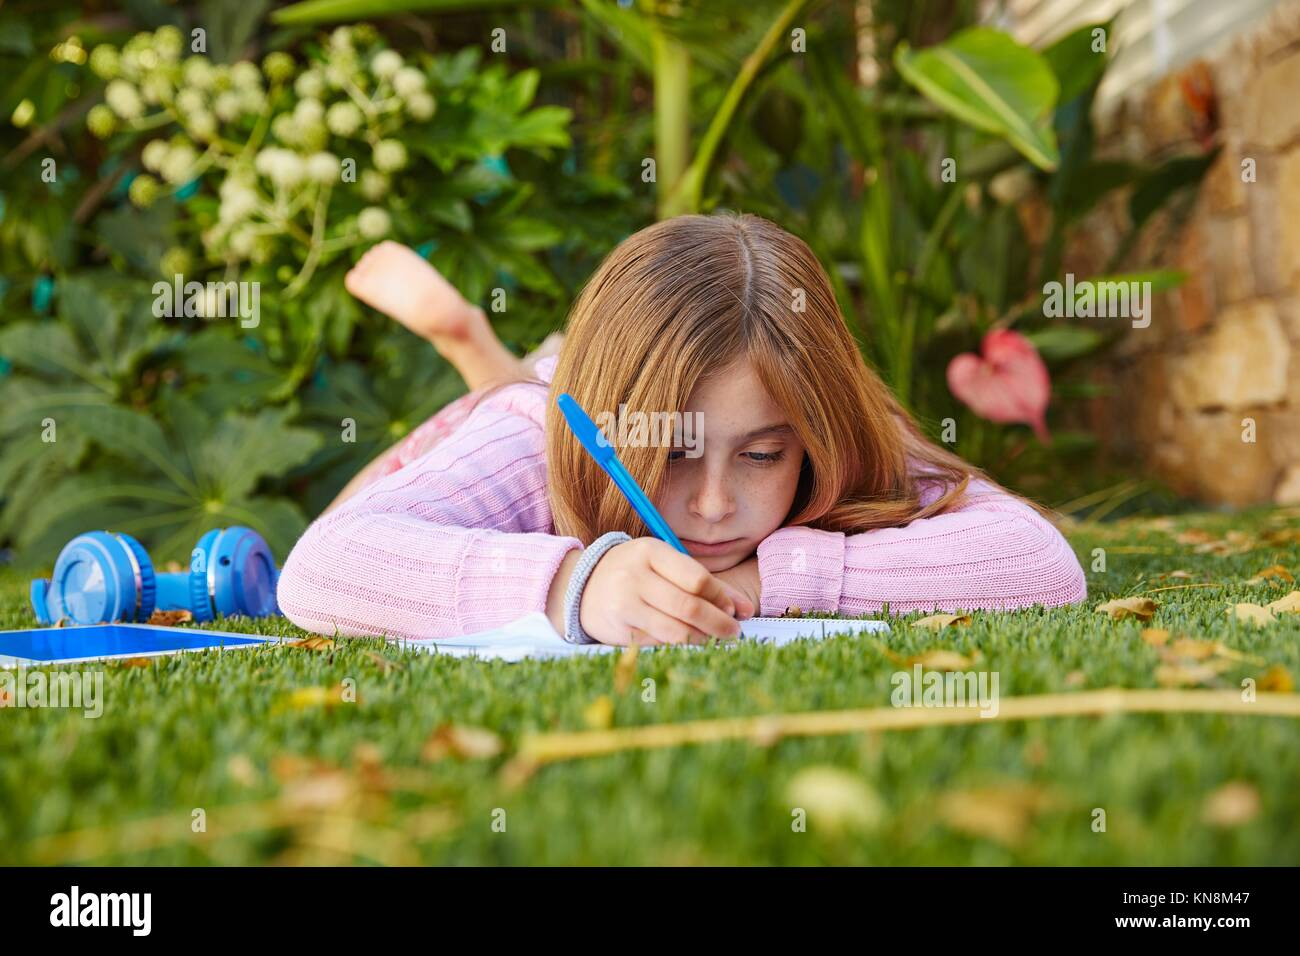 Blond kid girl homework lying on grass turf writting notebook. - Stock Image